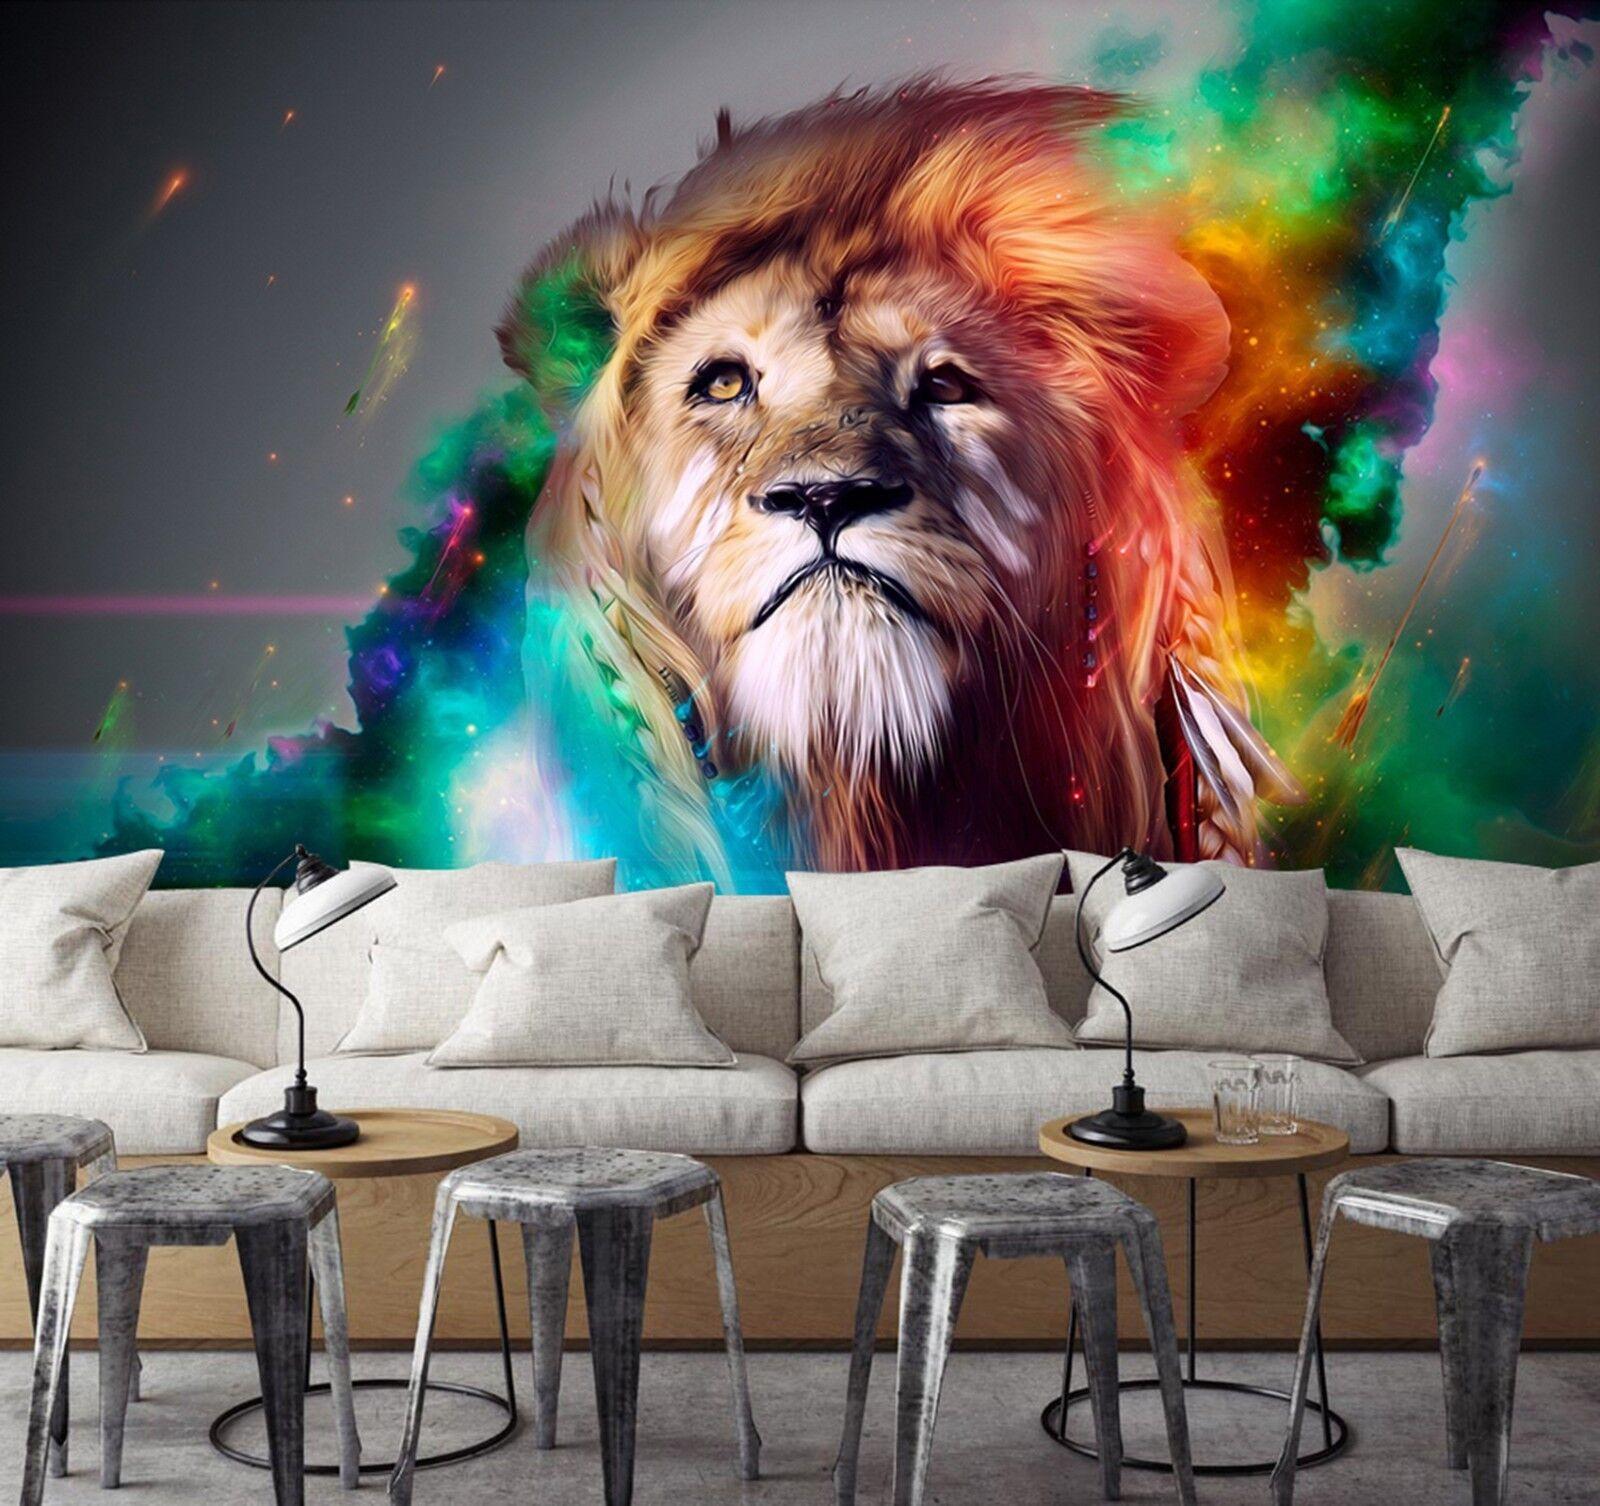 3D Gemalter Löwe Flamme 893 Tapete Wandgemälde Tapeten Bild Familie DE Lemon | Eleganter Stil  | Offizielle Webseite  | Internationale Wahl